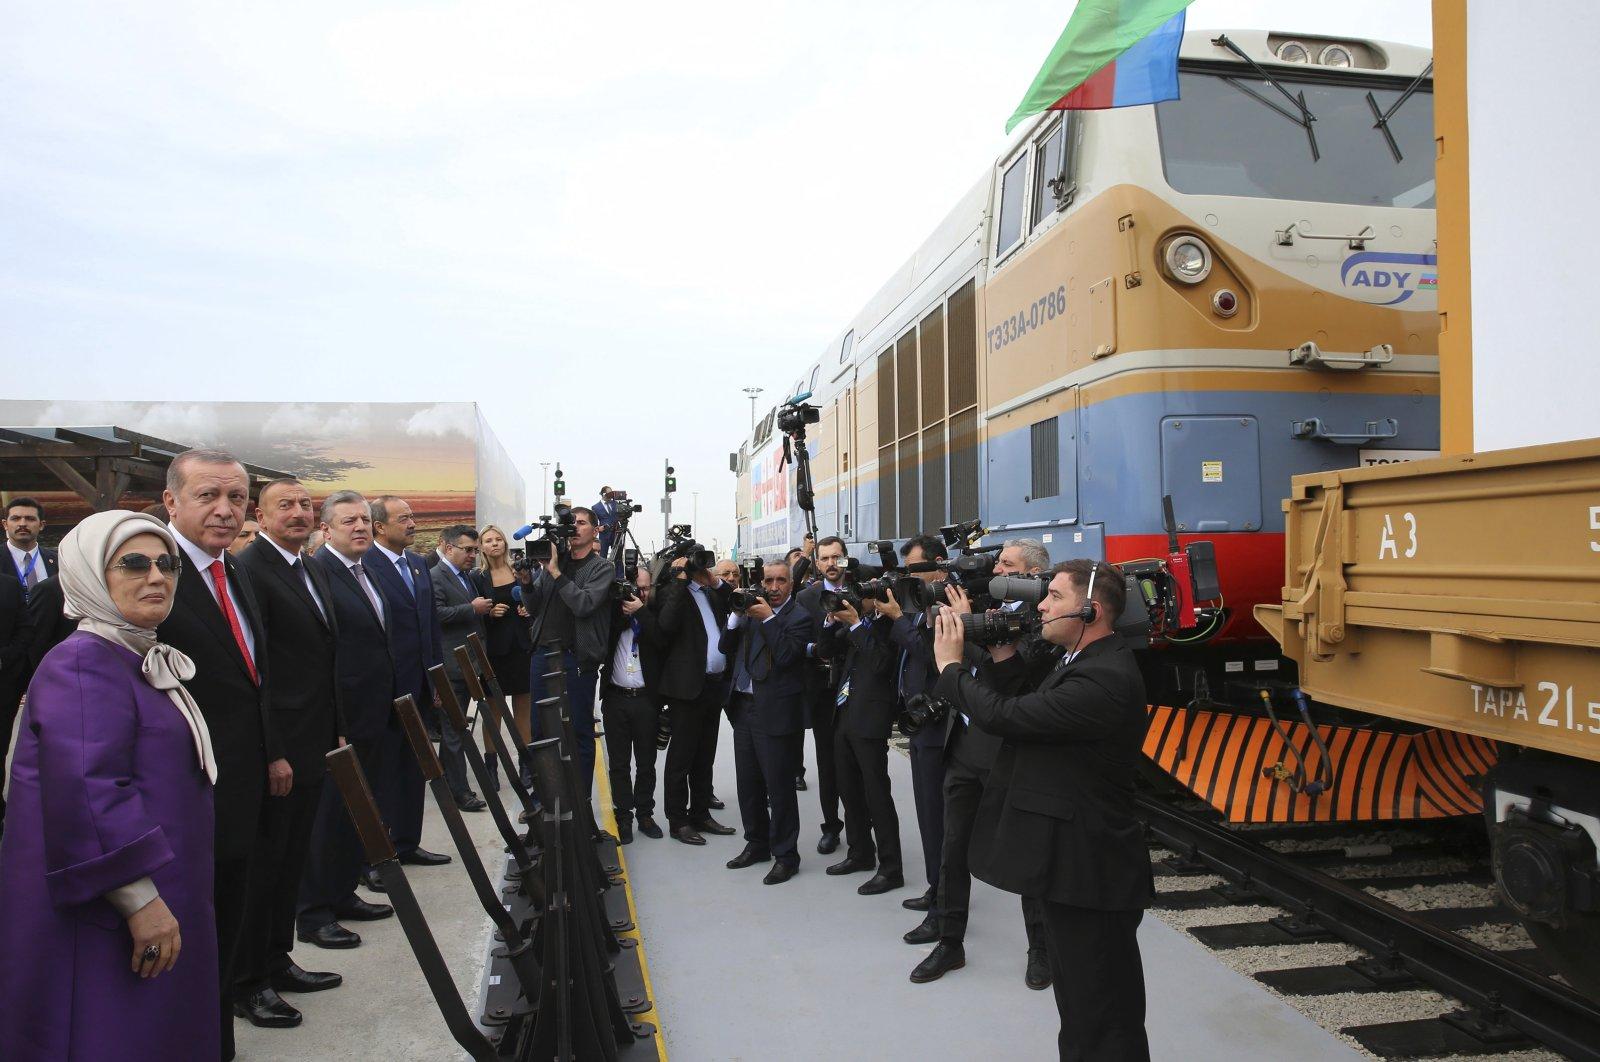 Turkey's President Recep Tayyip Erdoğan, (2nd L), accompanied by his wife, Emine, (L), Azerbaijan's President Ilham Aliyev, (3rd L) and Georgia's Prime Minister Giorgi Kvirikashvili, (4th L), inaugurate the Baku-Tbilisi-Kars railway, at a ceremony in Baku, Azerbaijan, Oct. 30, 2017. (Pool Photo via AP)